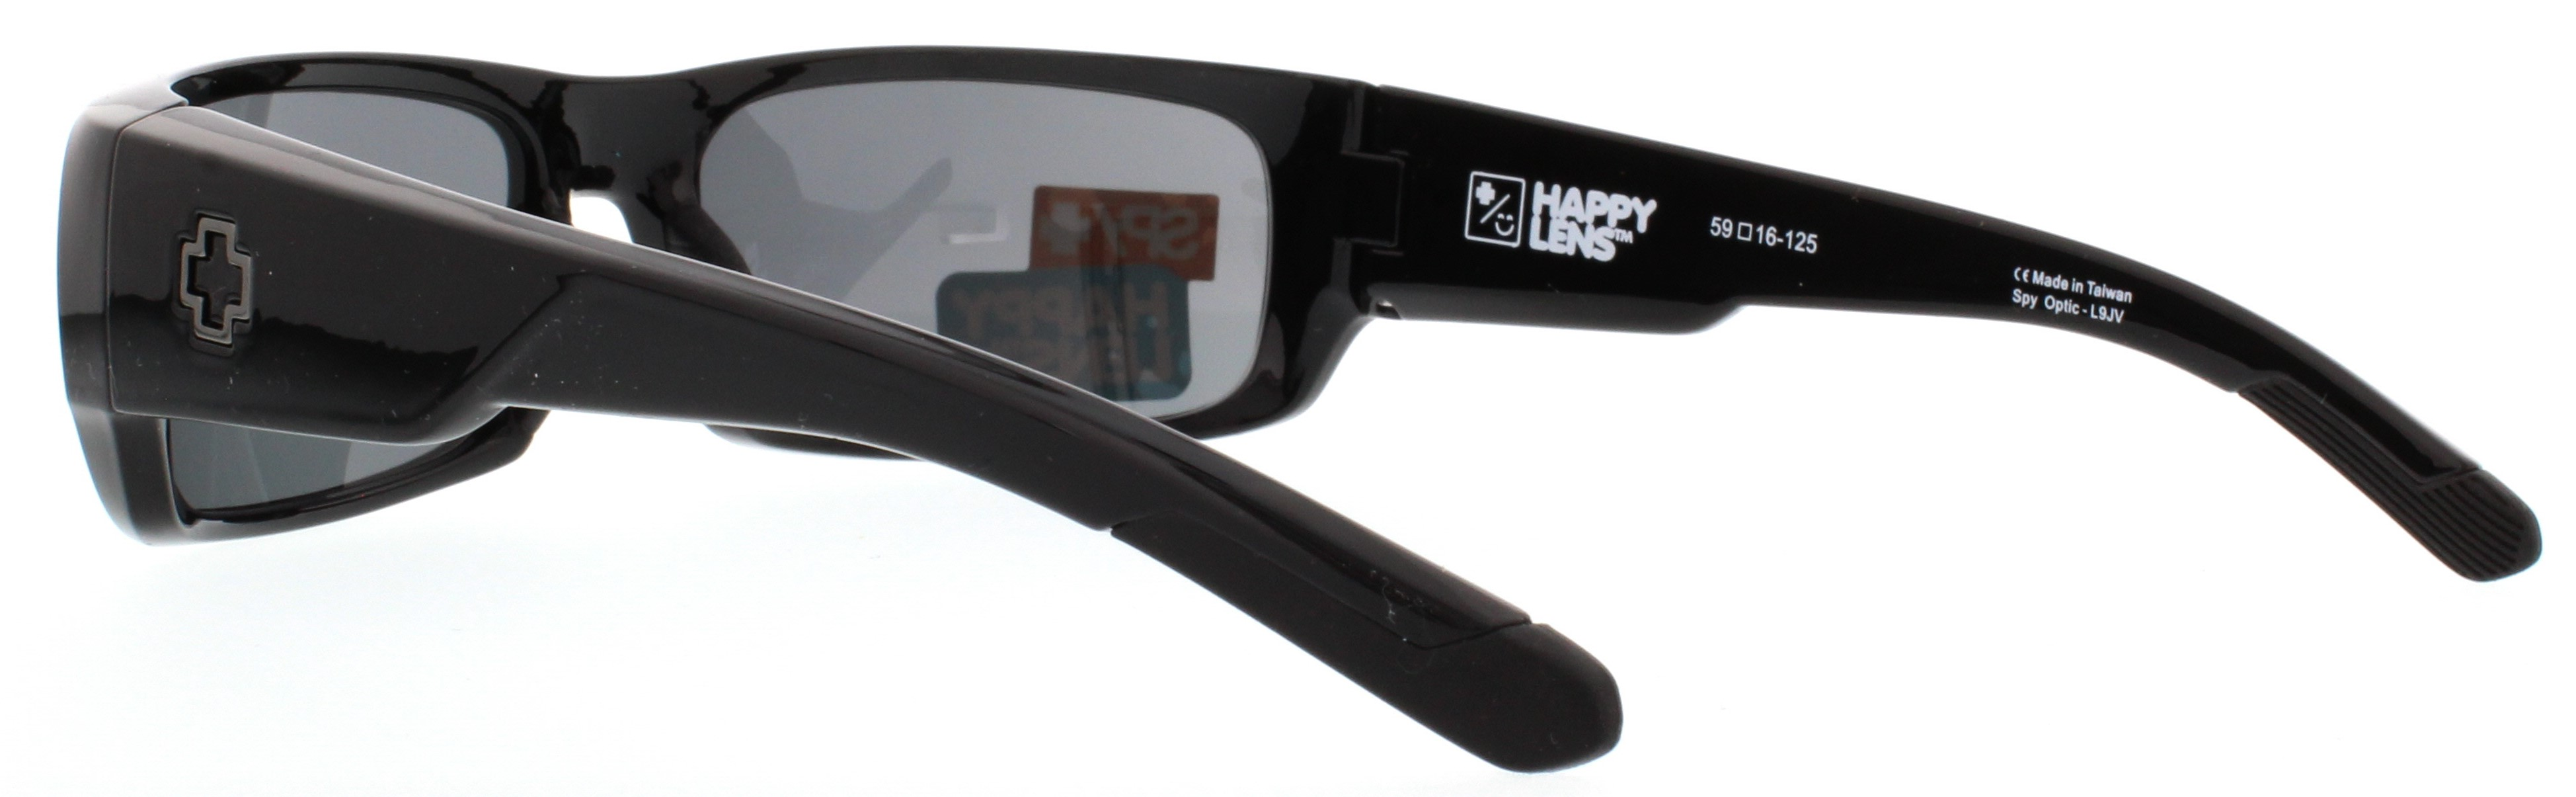 54f3928ca01 Spy Optic Caliber Wrap Sunglasses Black  Happy Gray  Green 59 mm ...